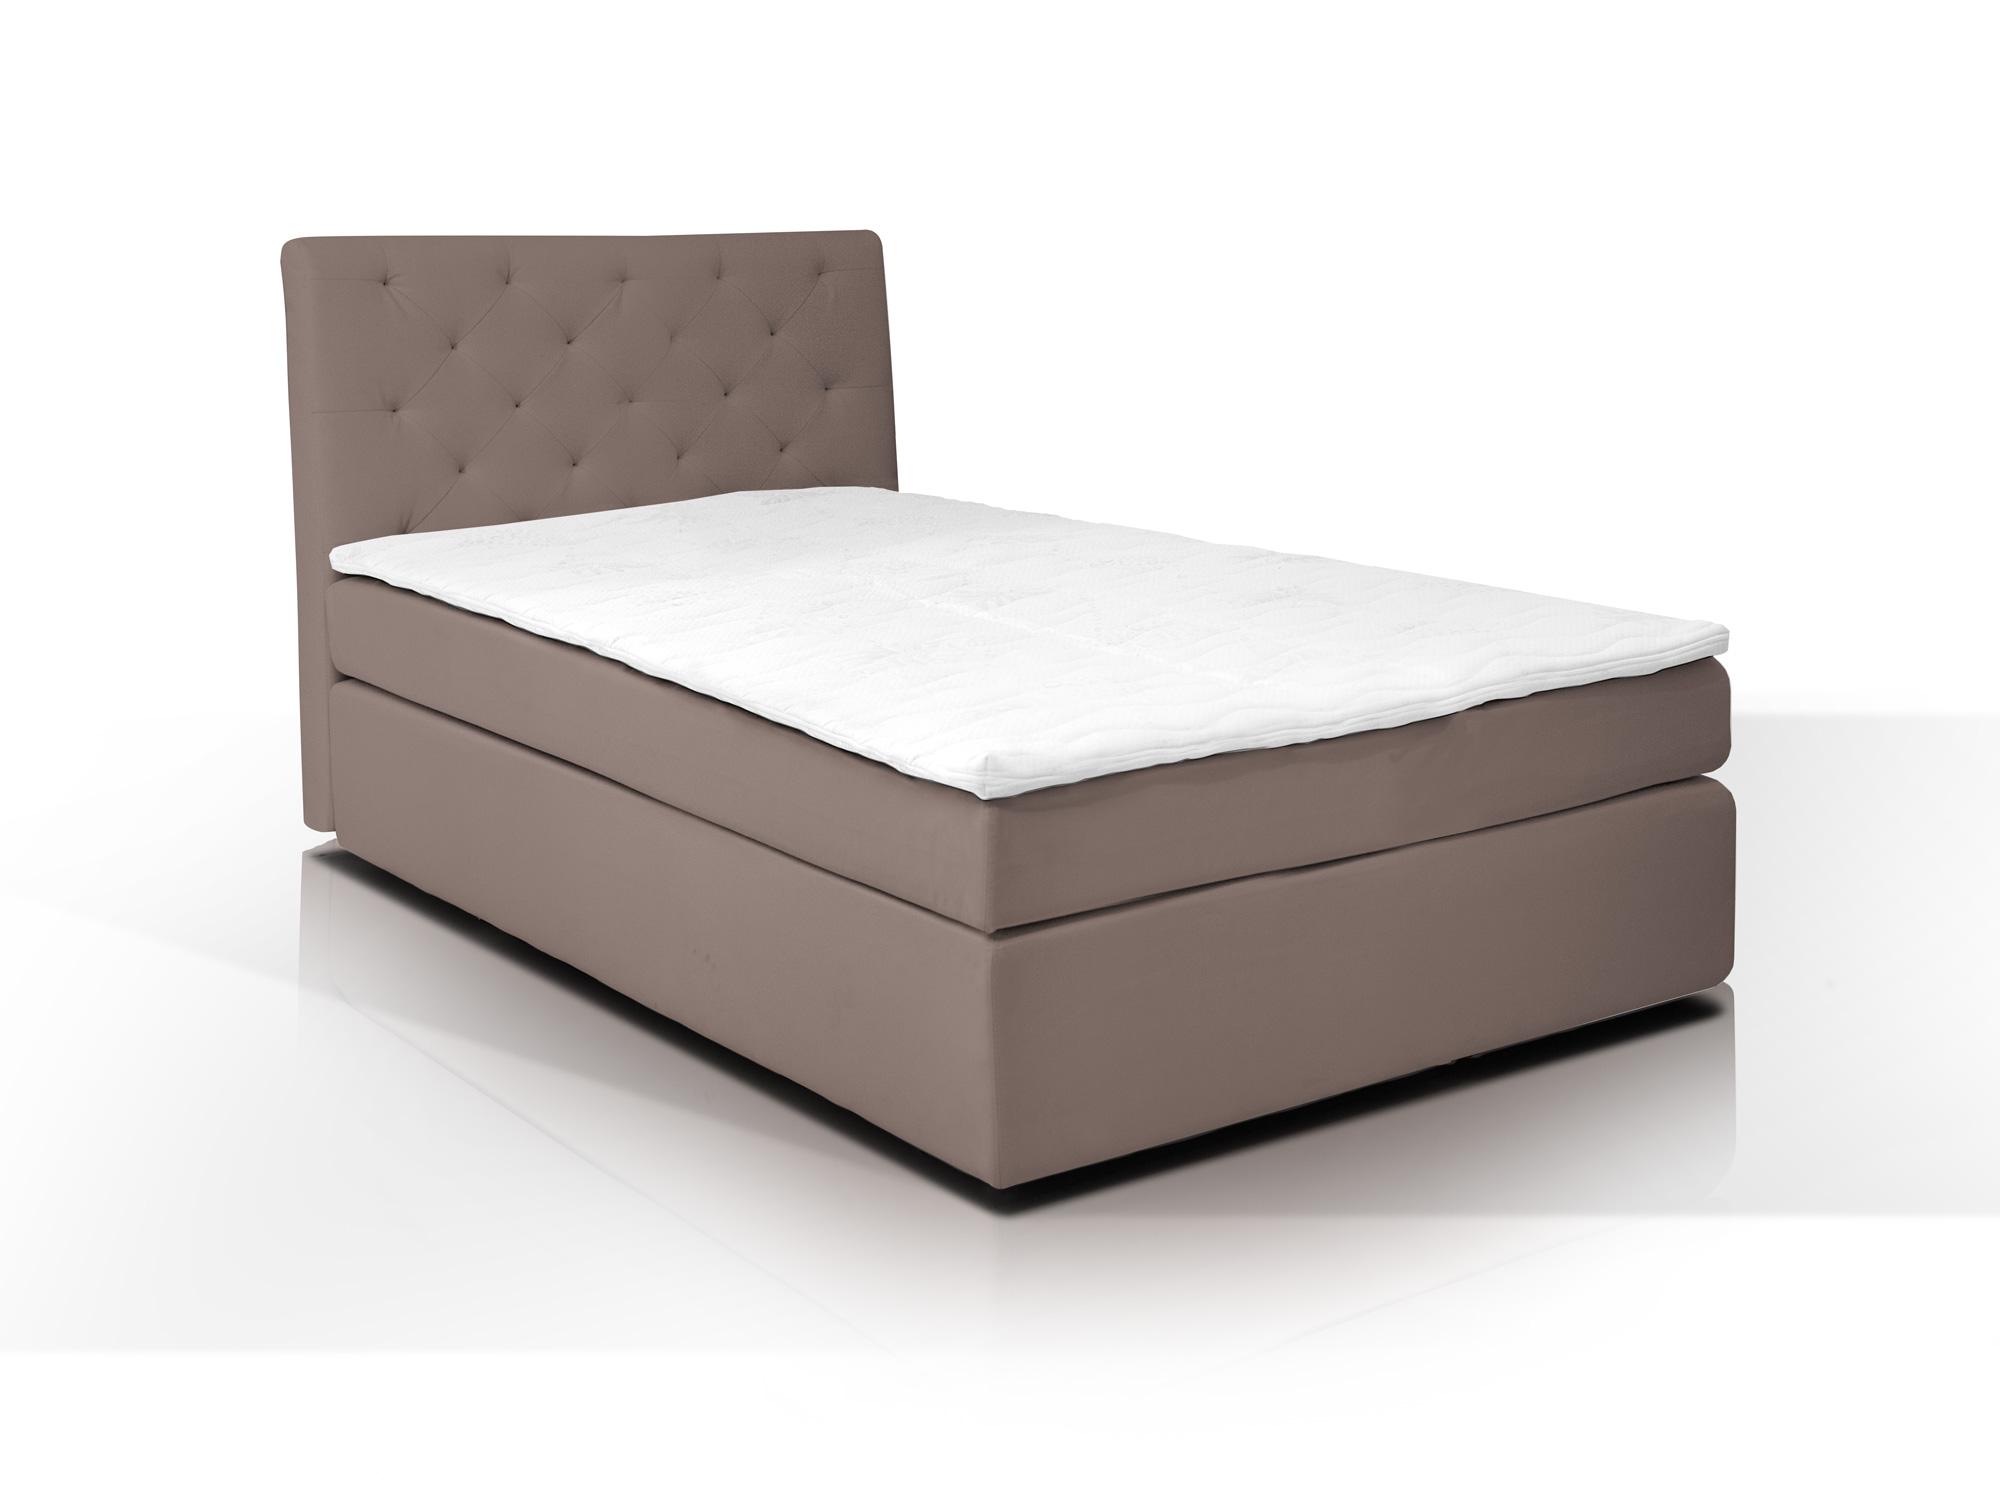 boxspringbett hotel webstoffbezug 80 x 200 cm hellbraun h rtegrad 3. Black Bedroom Furniture Sets. Home Design Ideas